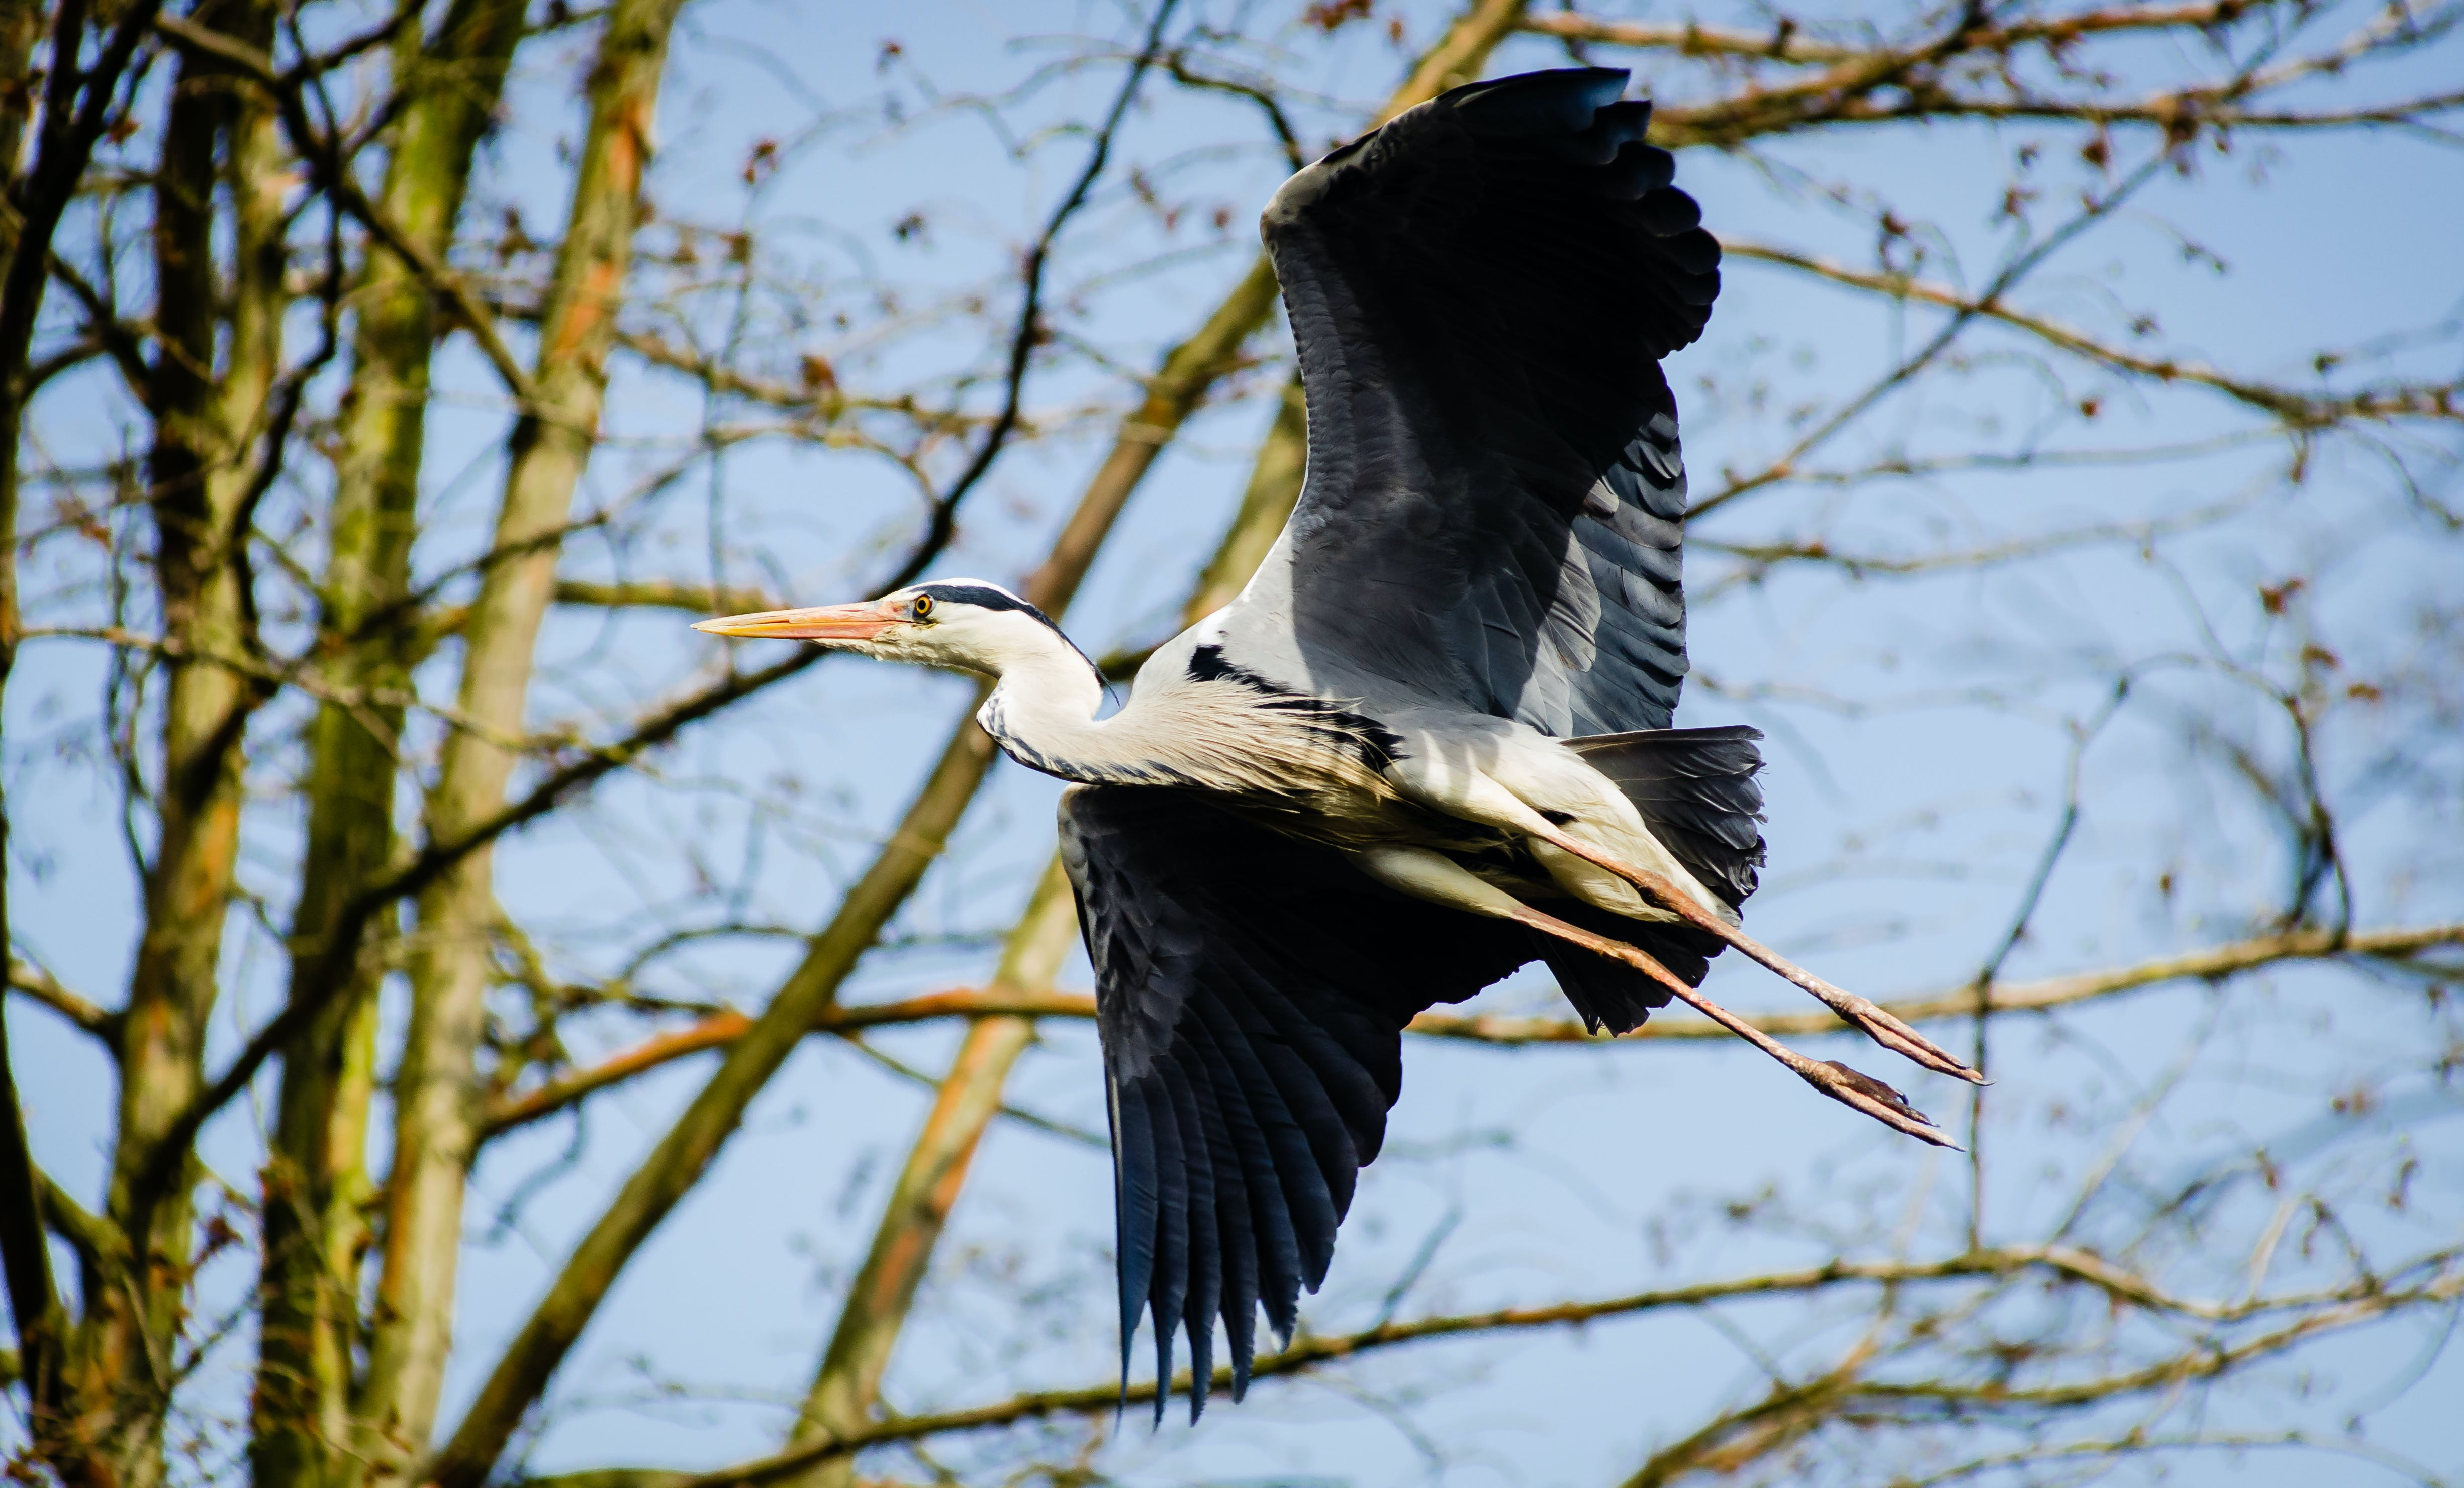 White Black Bird Flying during Daytime